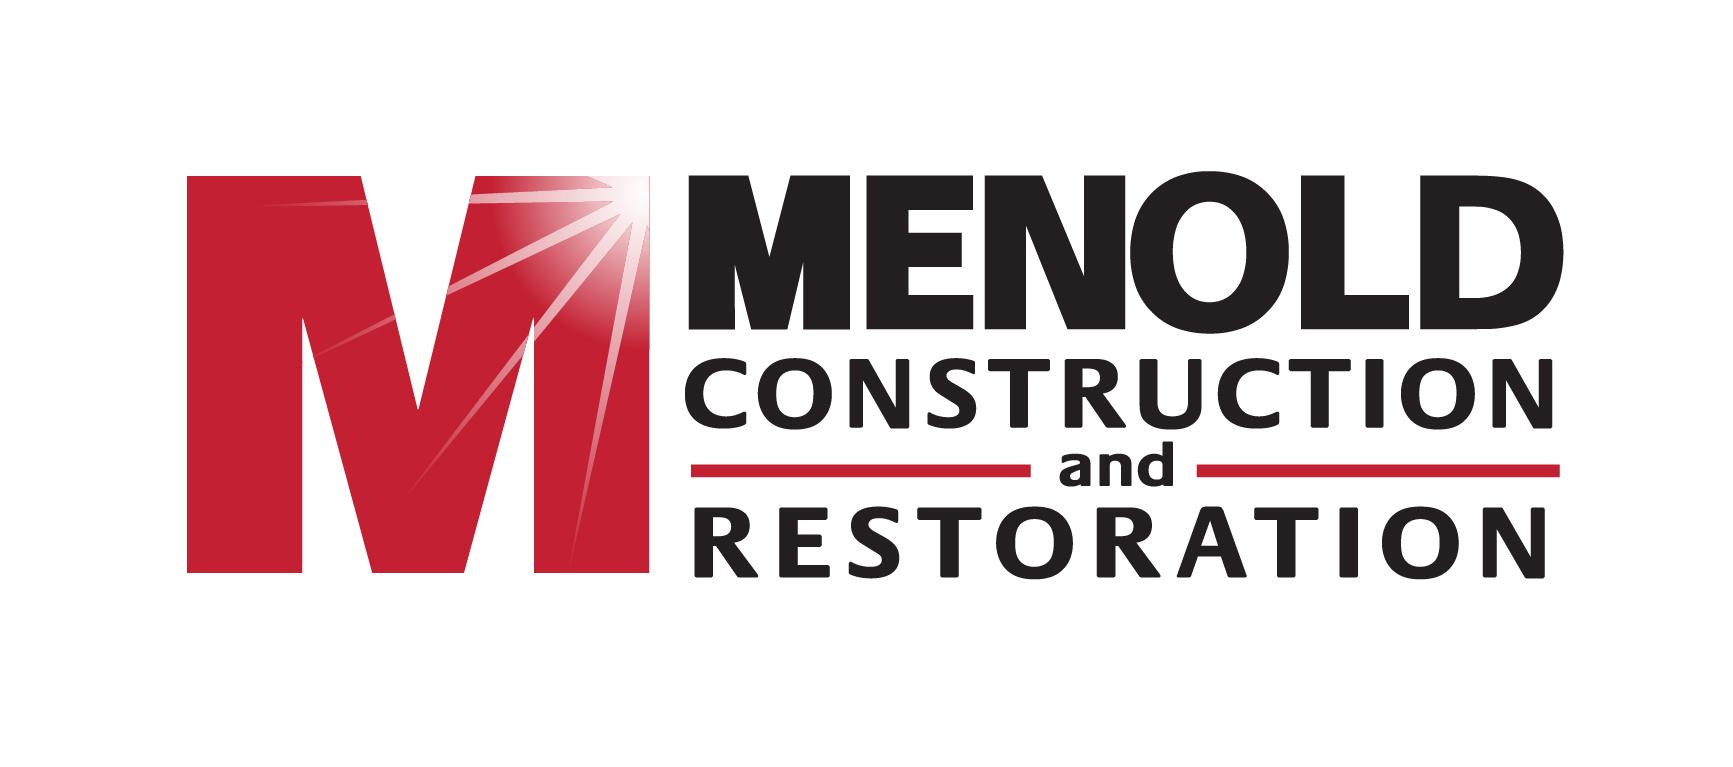 Menold-Construction-and-Restoration--logo